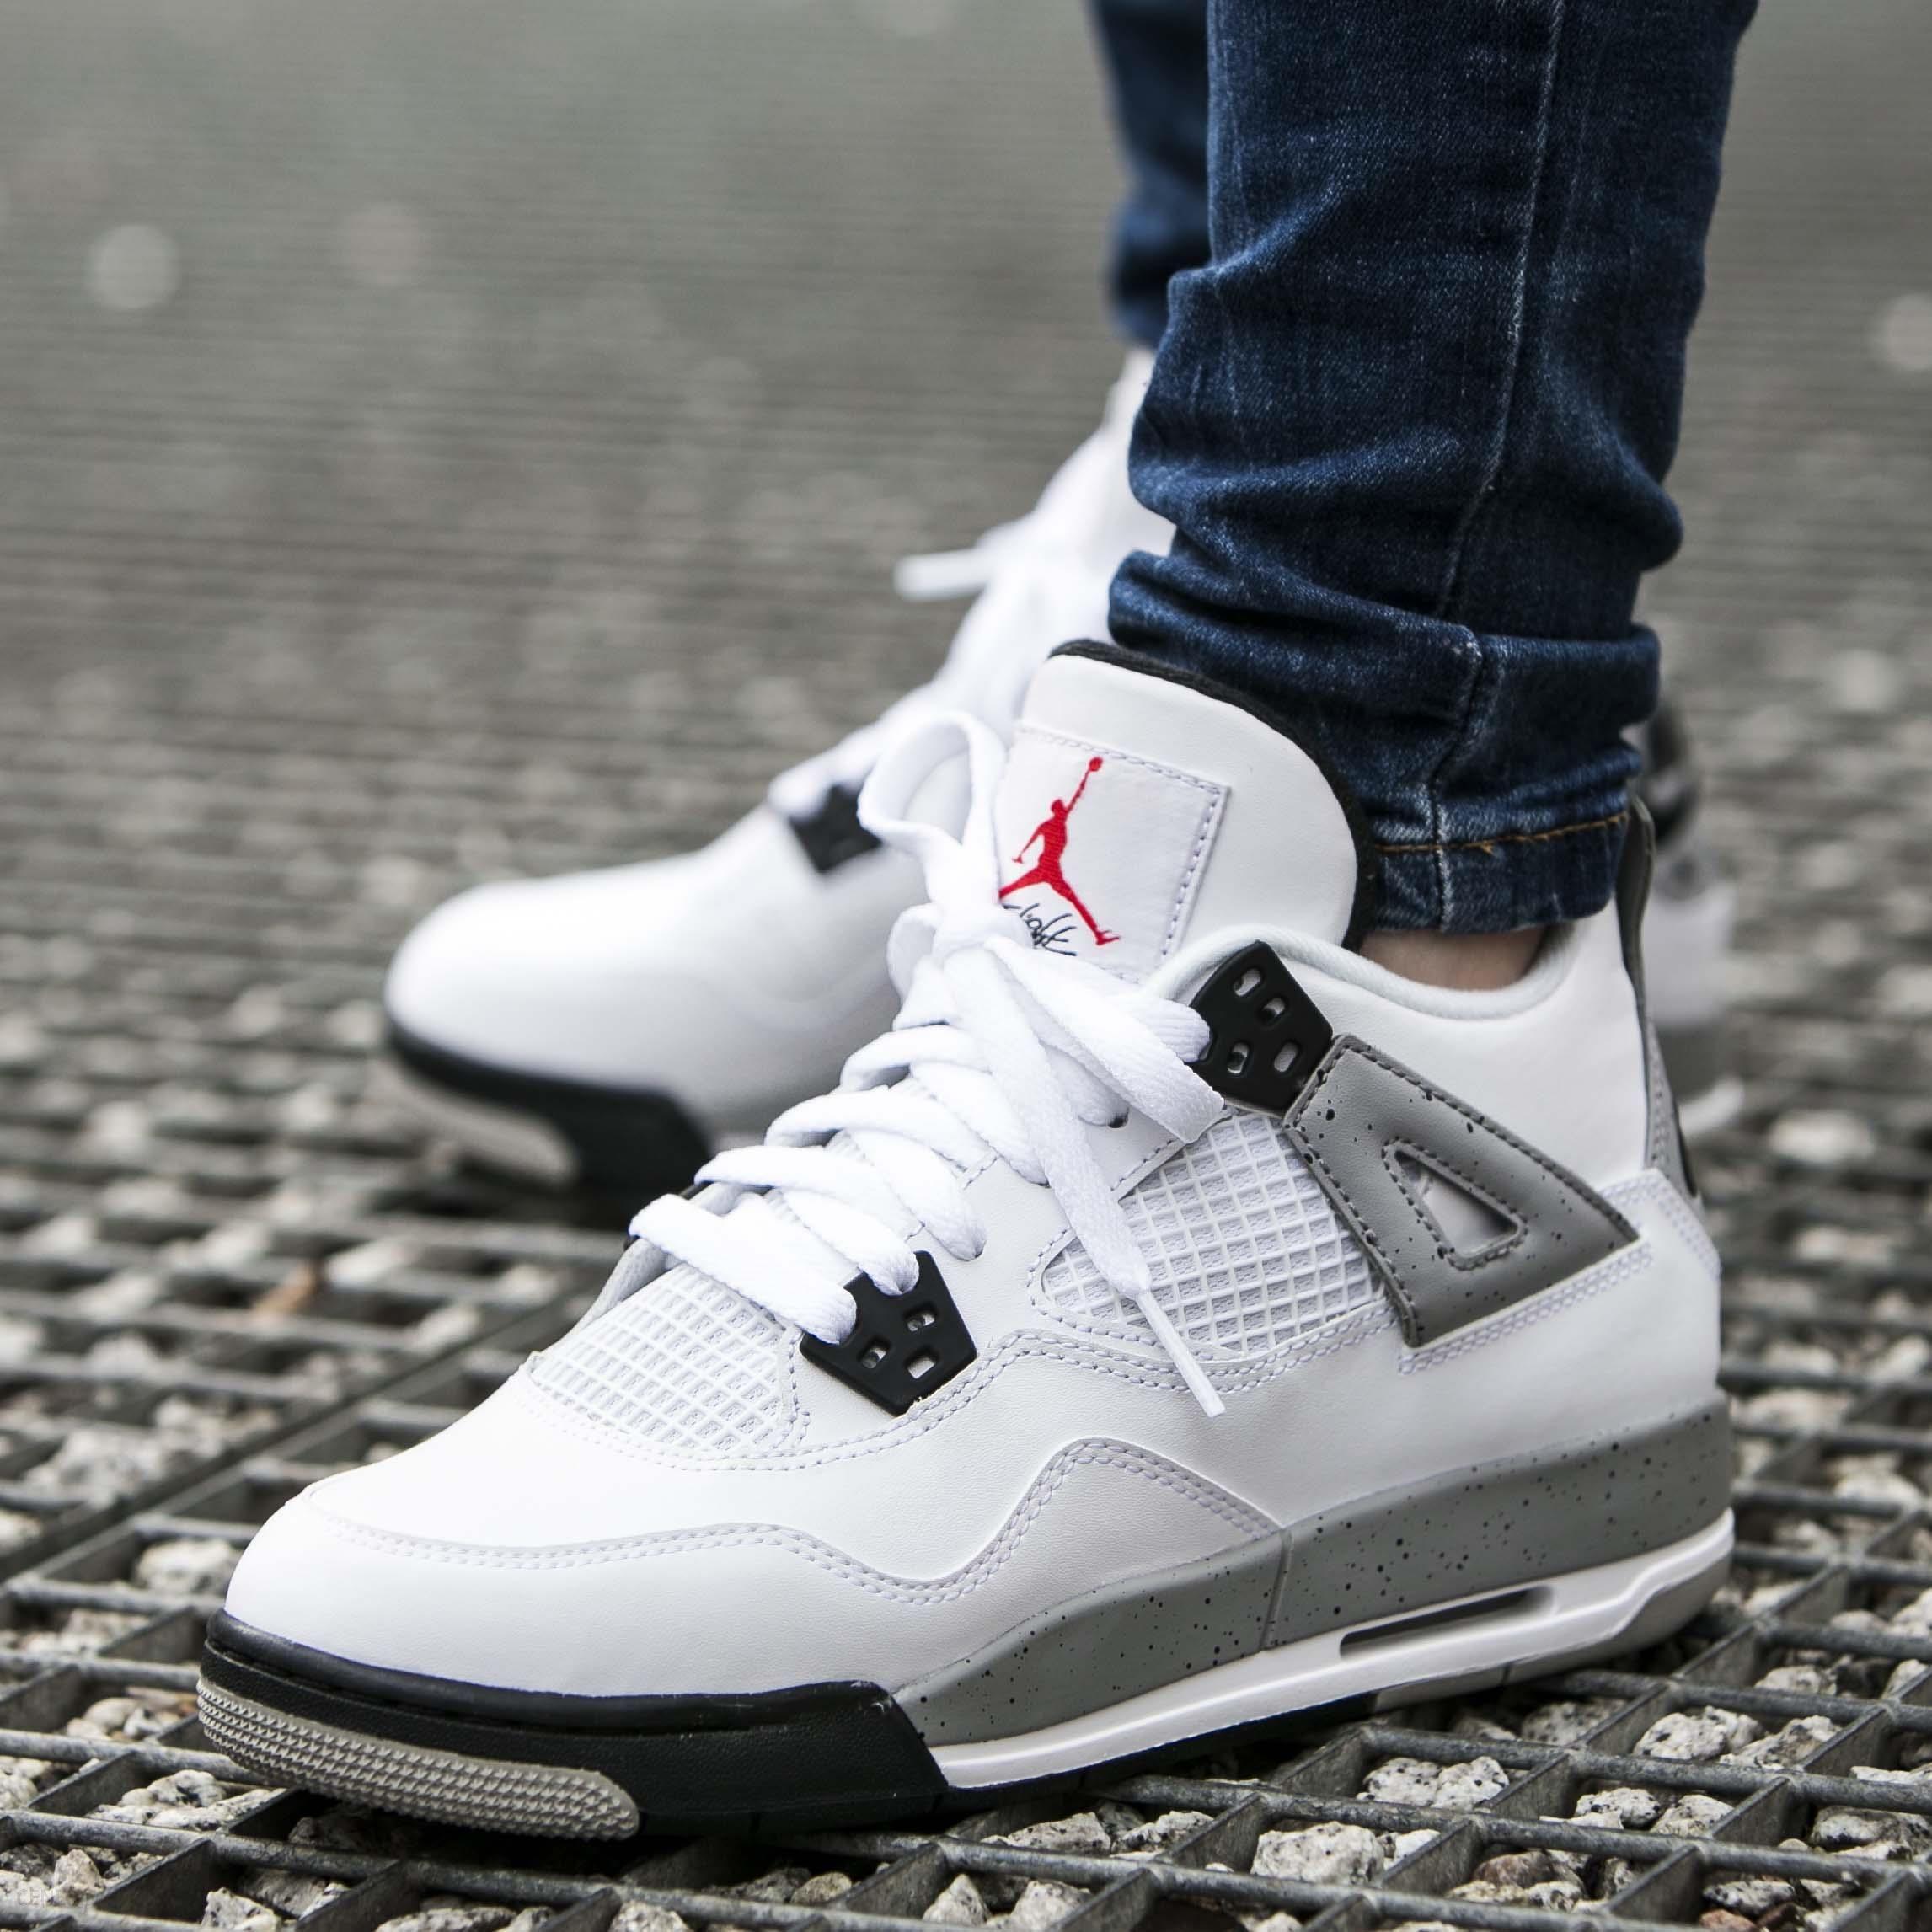 Robes Gris Noir Nike Air Jordan 4 Retro